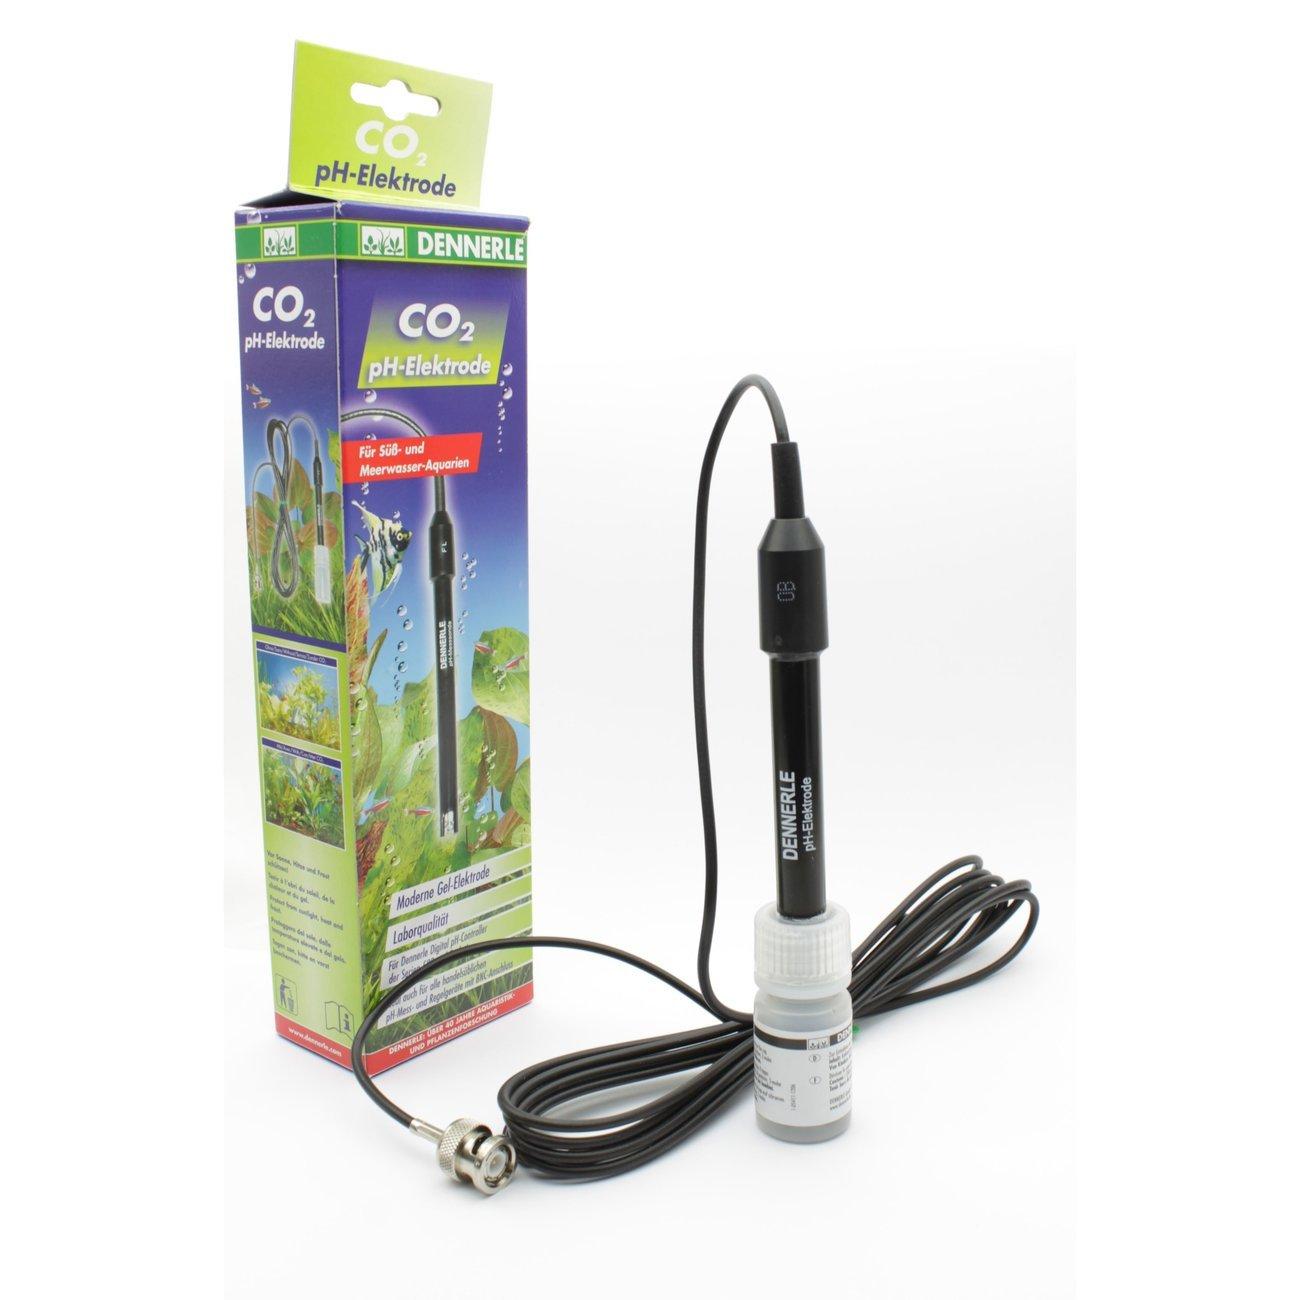 Dennerle CO2 pH-Elektrode, Bild 2